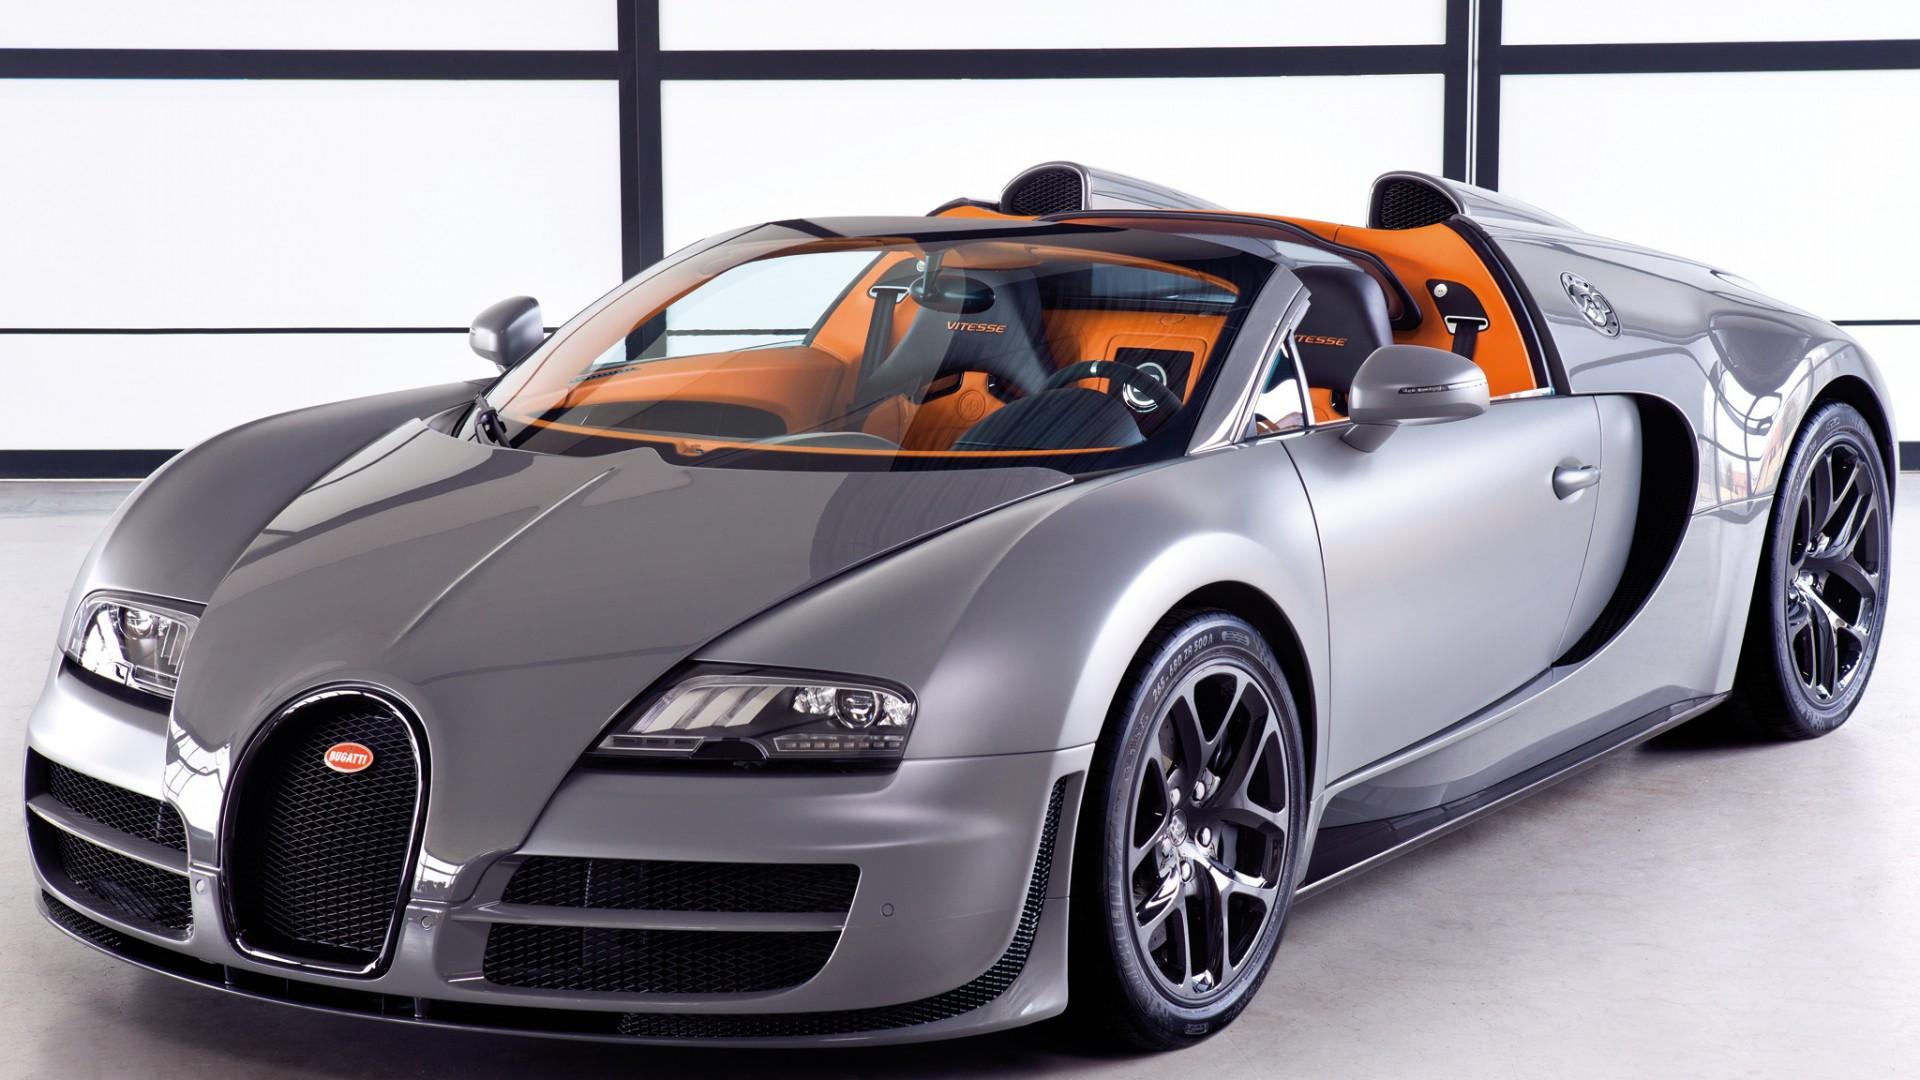 Bugatti-Veyron-Grand-Sport-Roadster-Vitesse-1920x1080 Remarkable Bugatti Veyron Grand Sport Vitesse Informacion Cars Trend